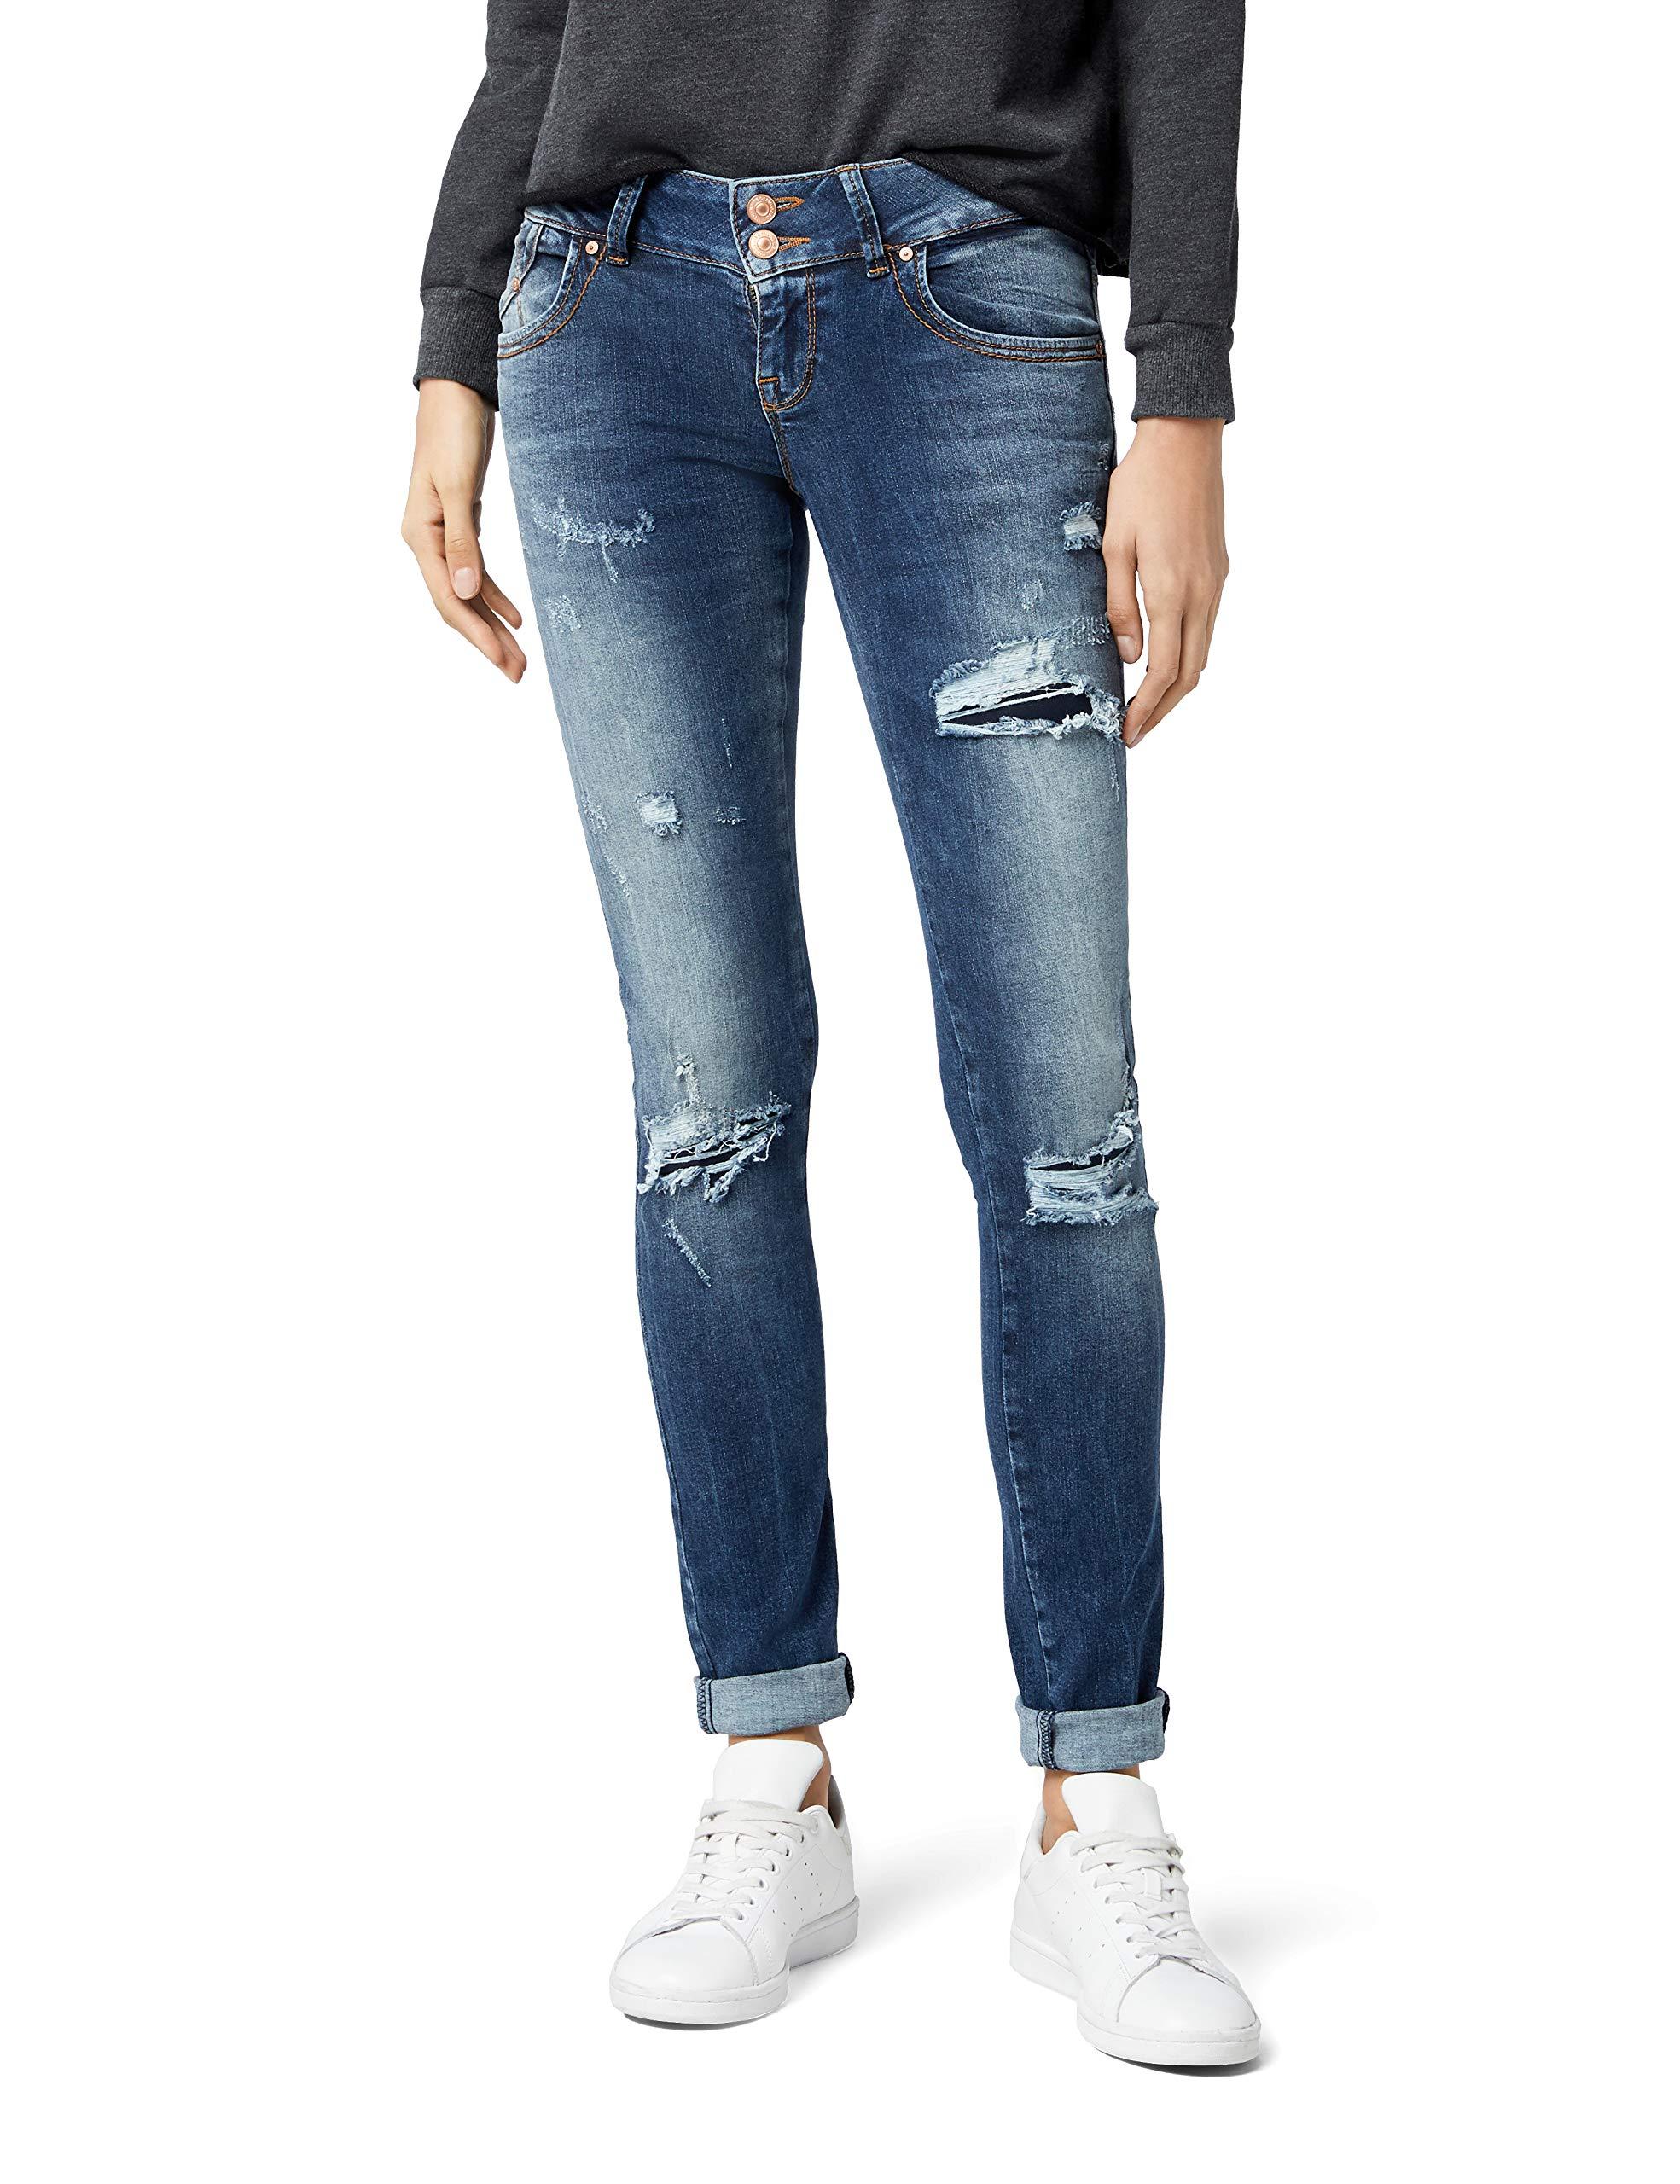 51260taille Du Ltb SlimBlaurennis Fabricant27 Jeans Jean Wash Molly 32Femme eYEH9IW2Db